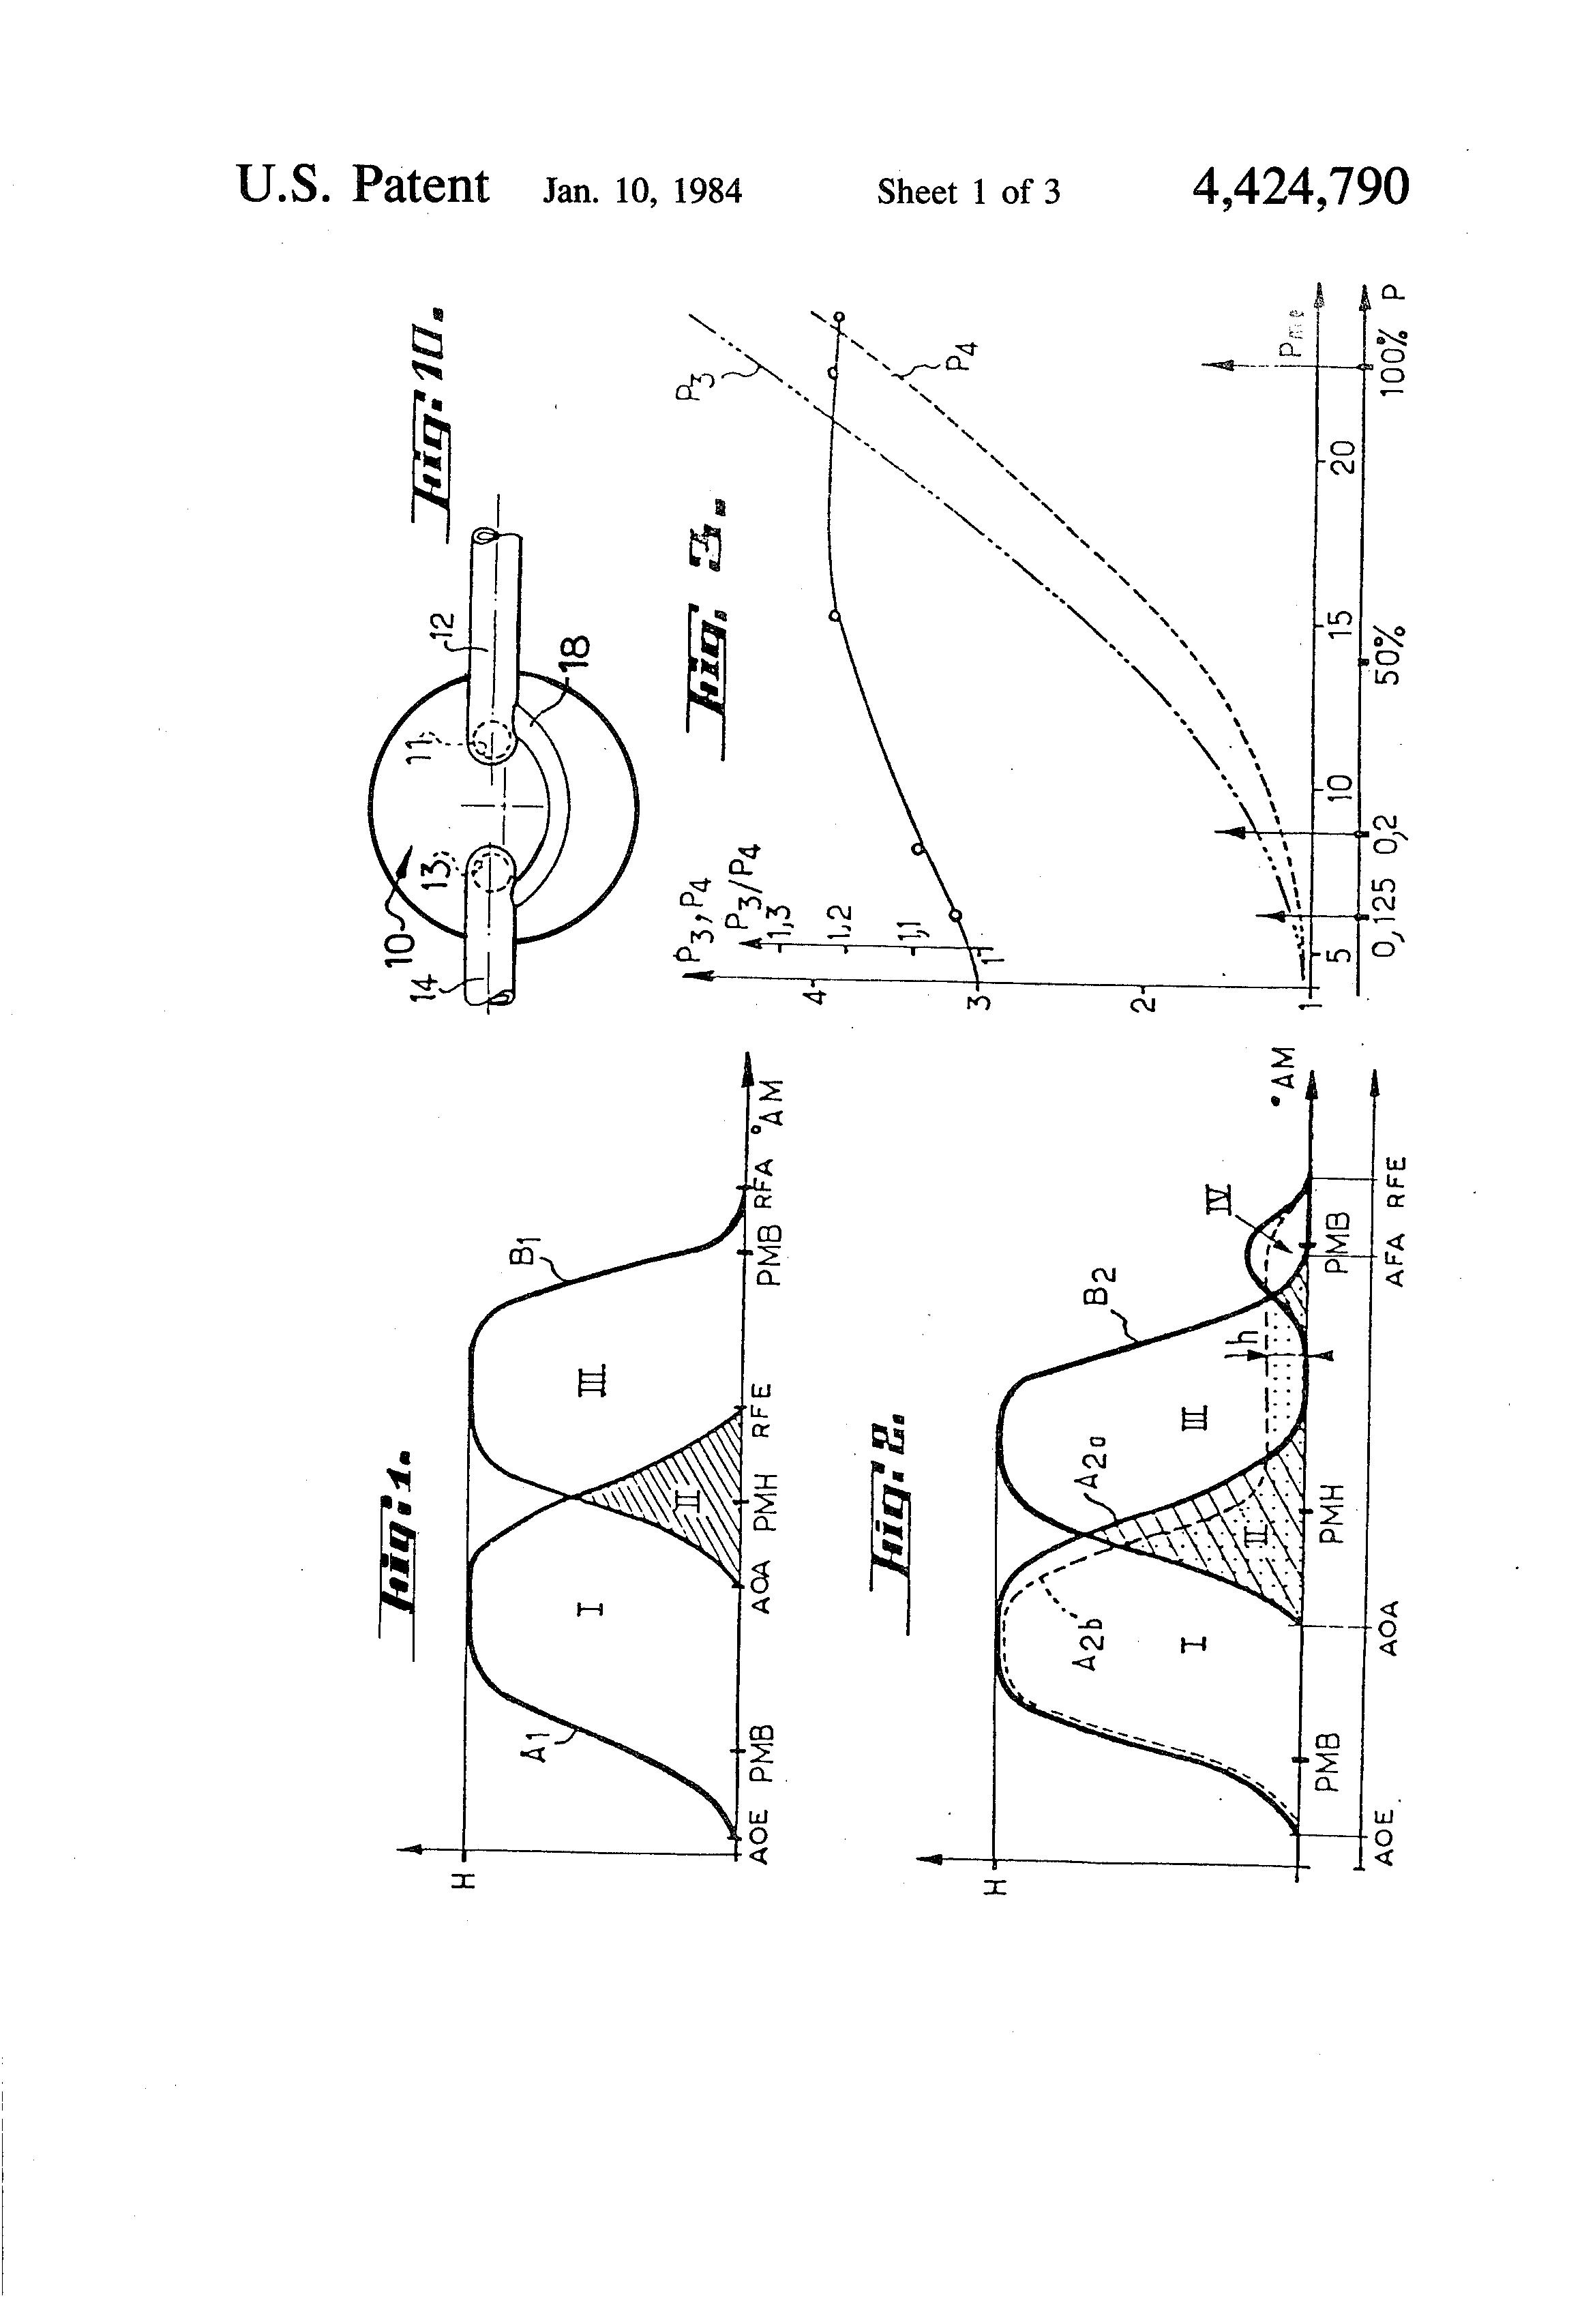 Us4424790 Us44247901. Us4424790 Us44247901. Wiring. Miller Cycle Engine Diagram At Justdesktopwallpapers.com